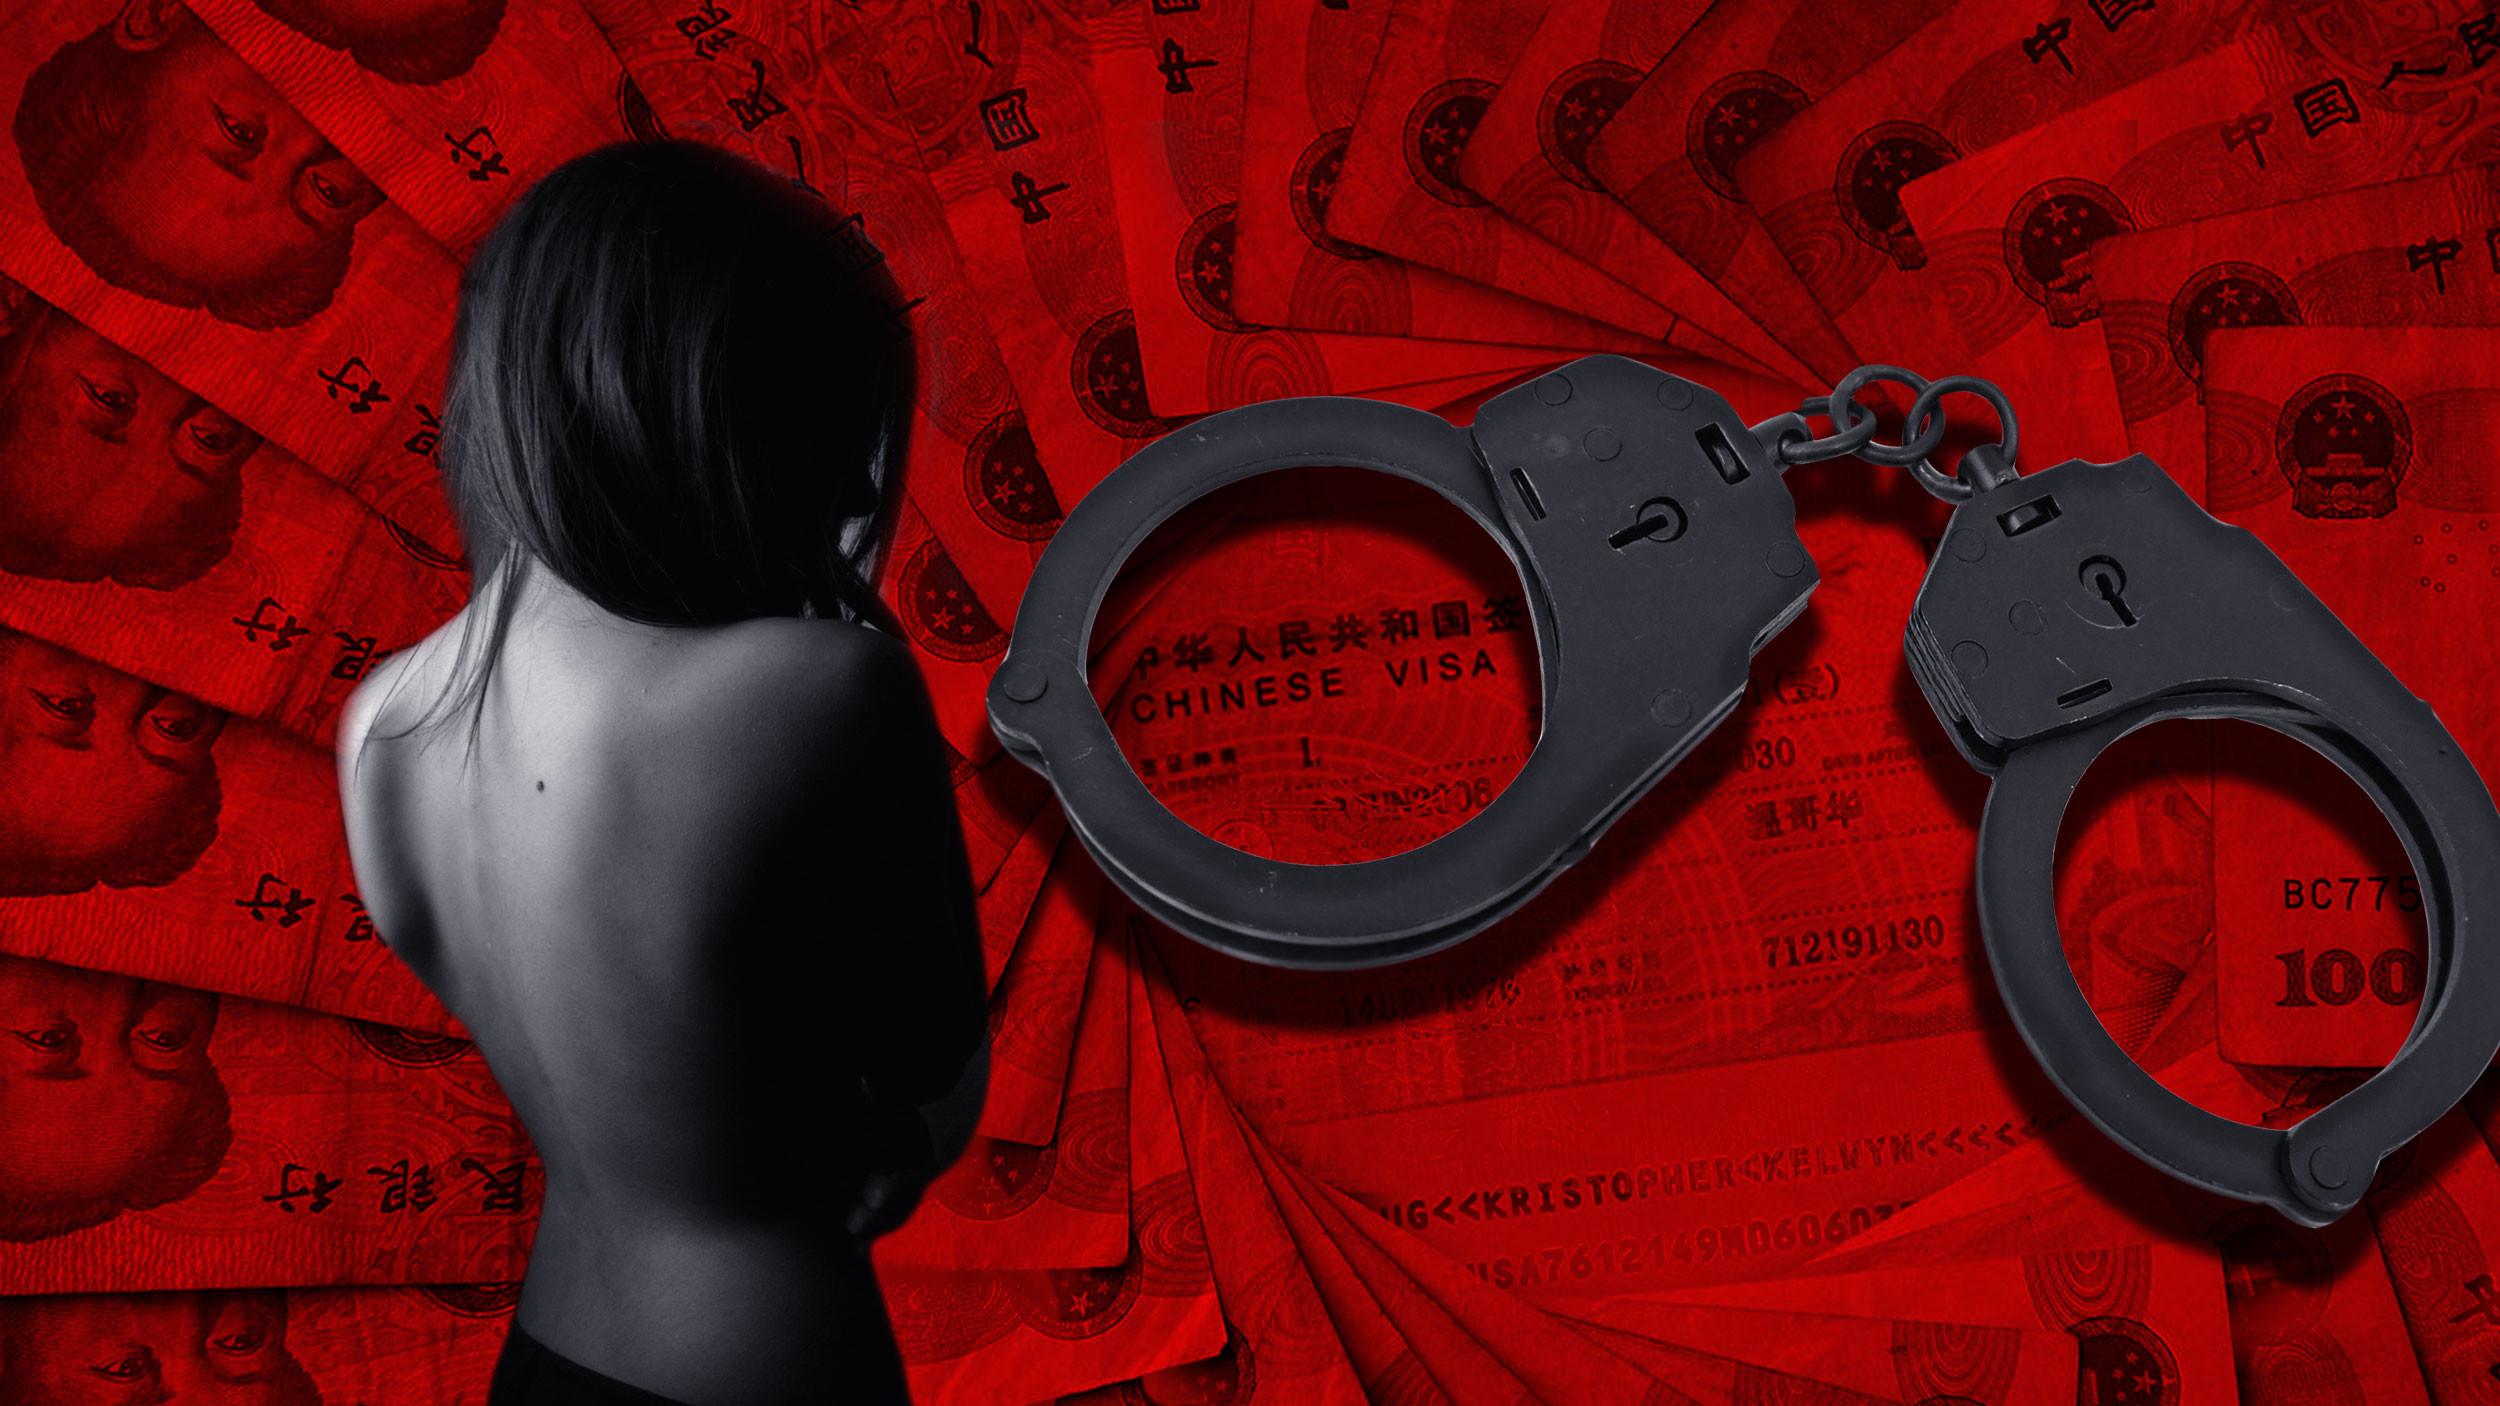 "<p>Коллаж © LIFE. Фото © Shutterstock, © <a href=""http://www.chinaforeignteachersunion.com/2017/02/"" target=""_self"">chinaforeignteachersunion</a>, © Public Domain</p>"